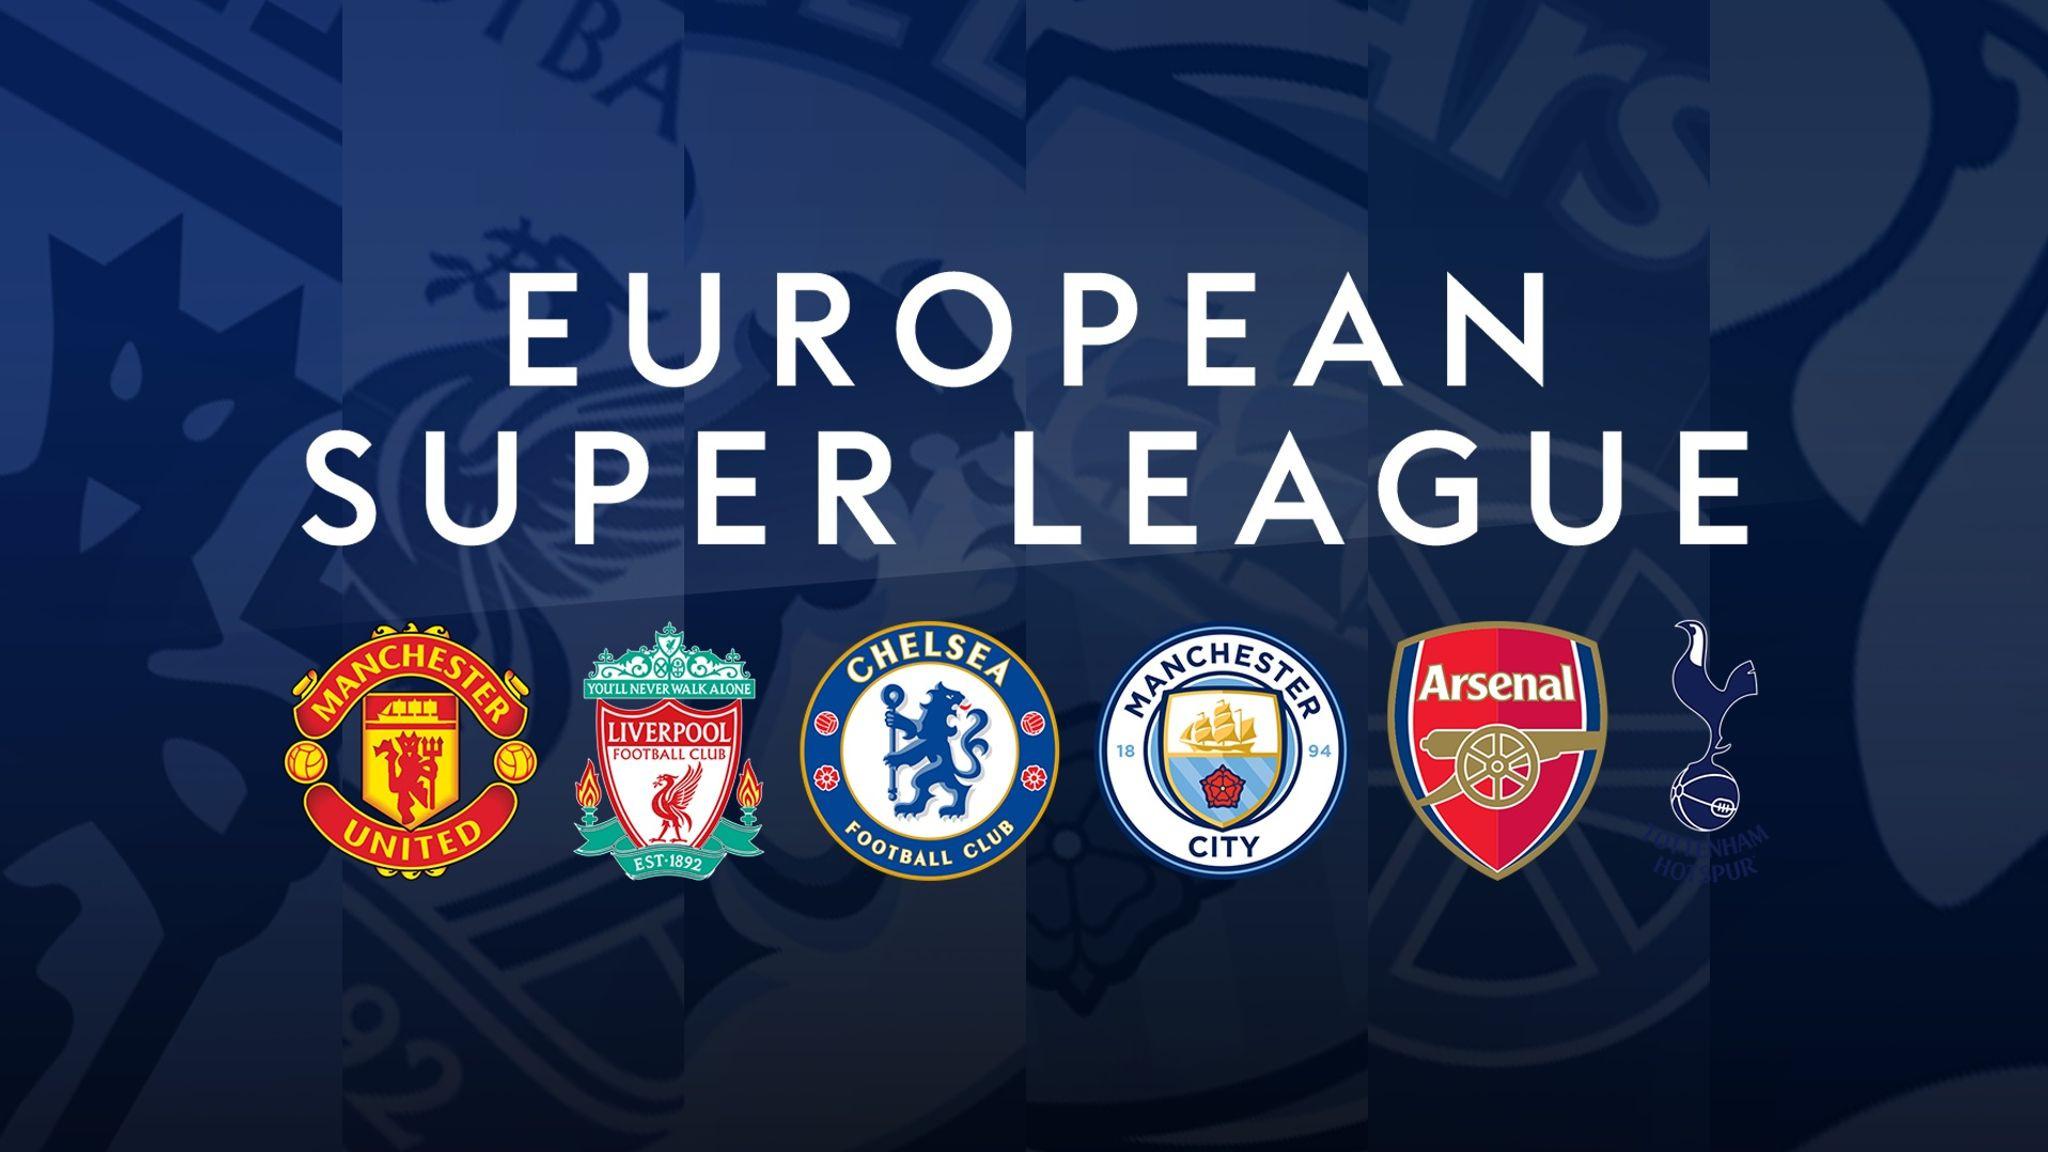 All six Premier League clubs who signed up to failed European Super League